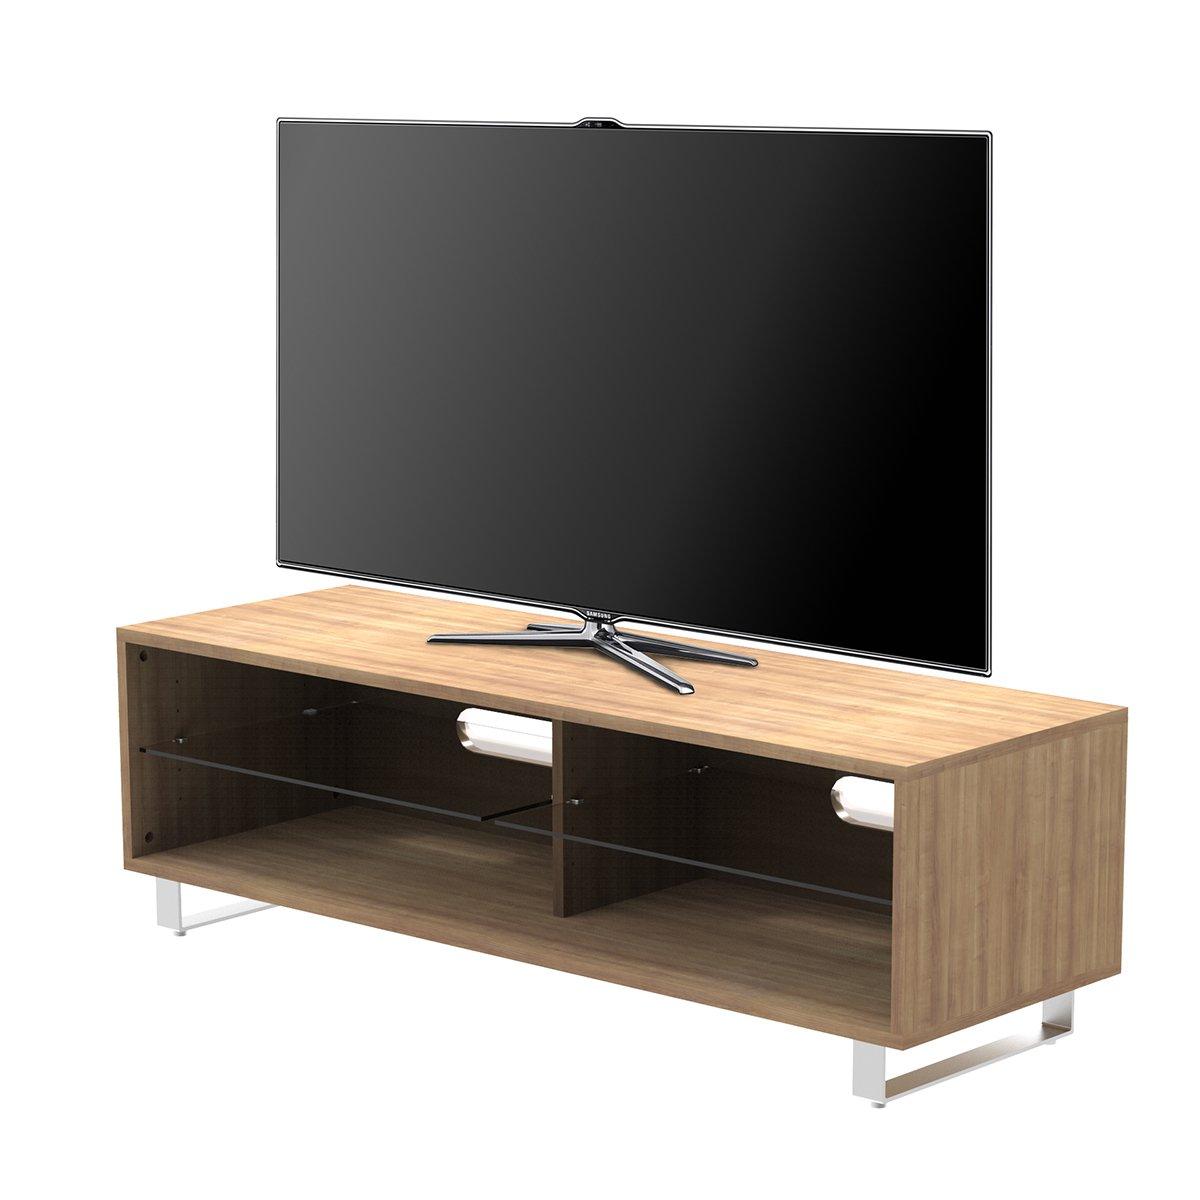 1home Tv Cabinet Bois Etag Res Adjustable Pieds Forme U Largeur  # Meuble Tv Brut